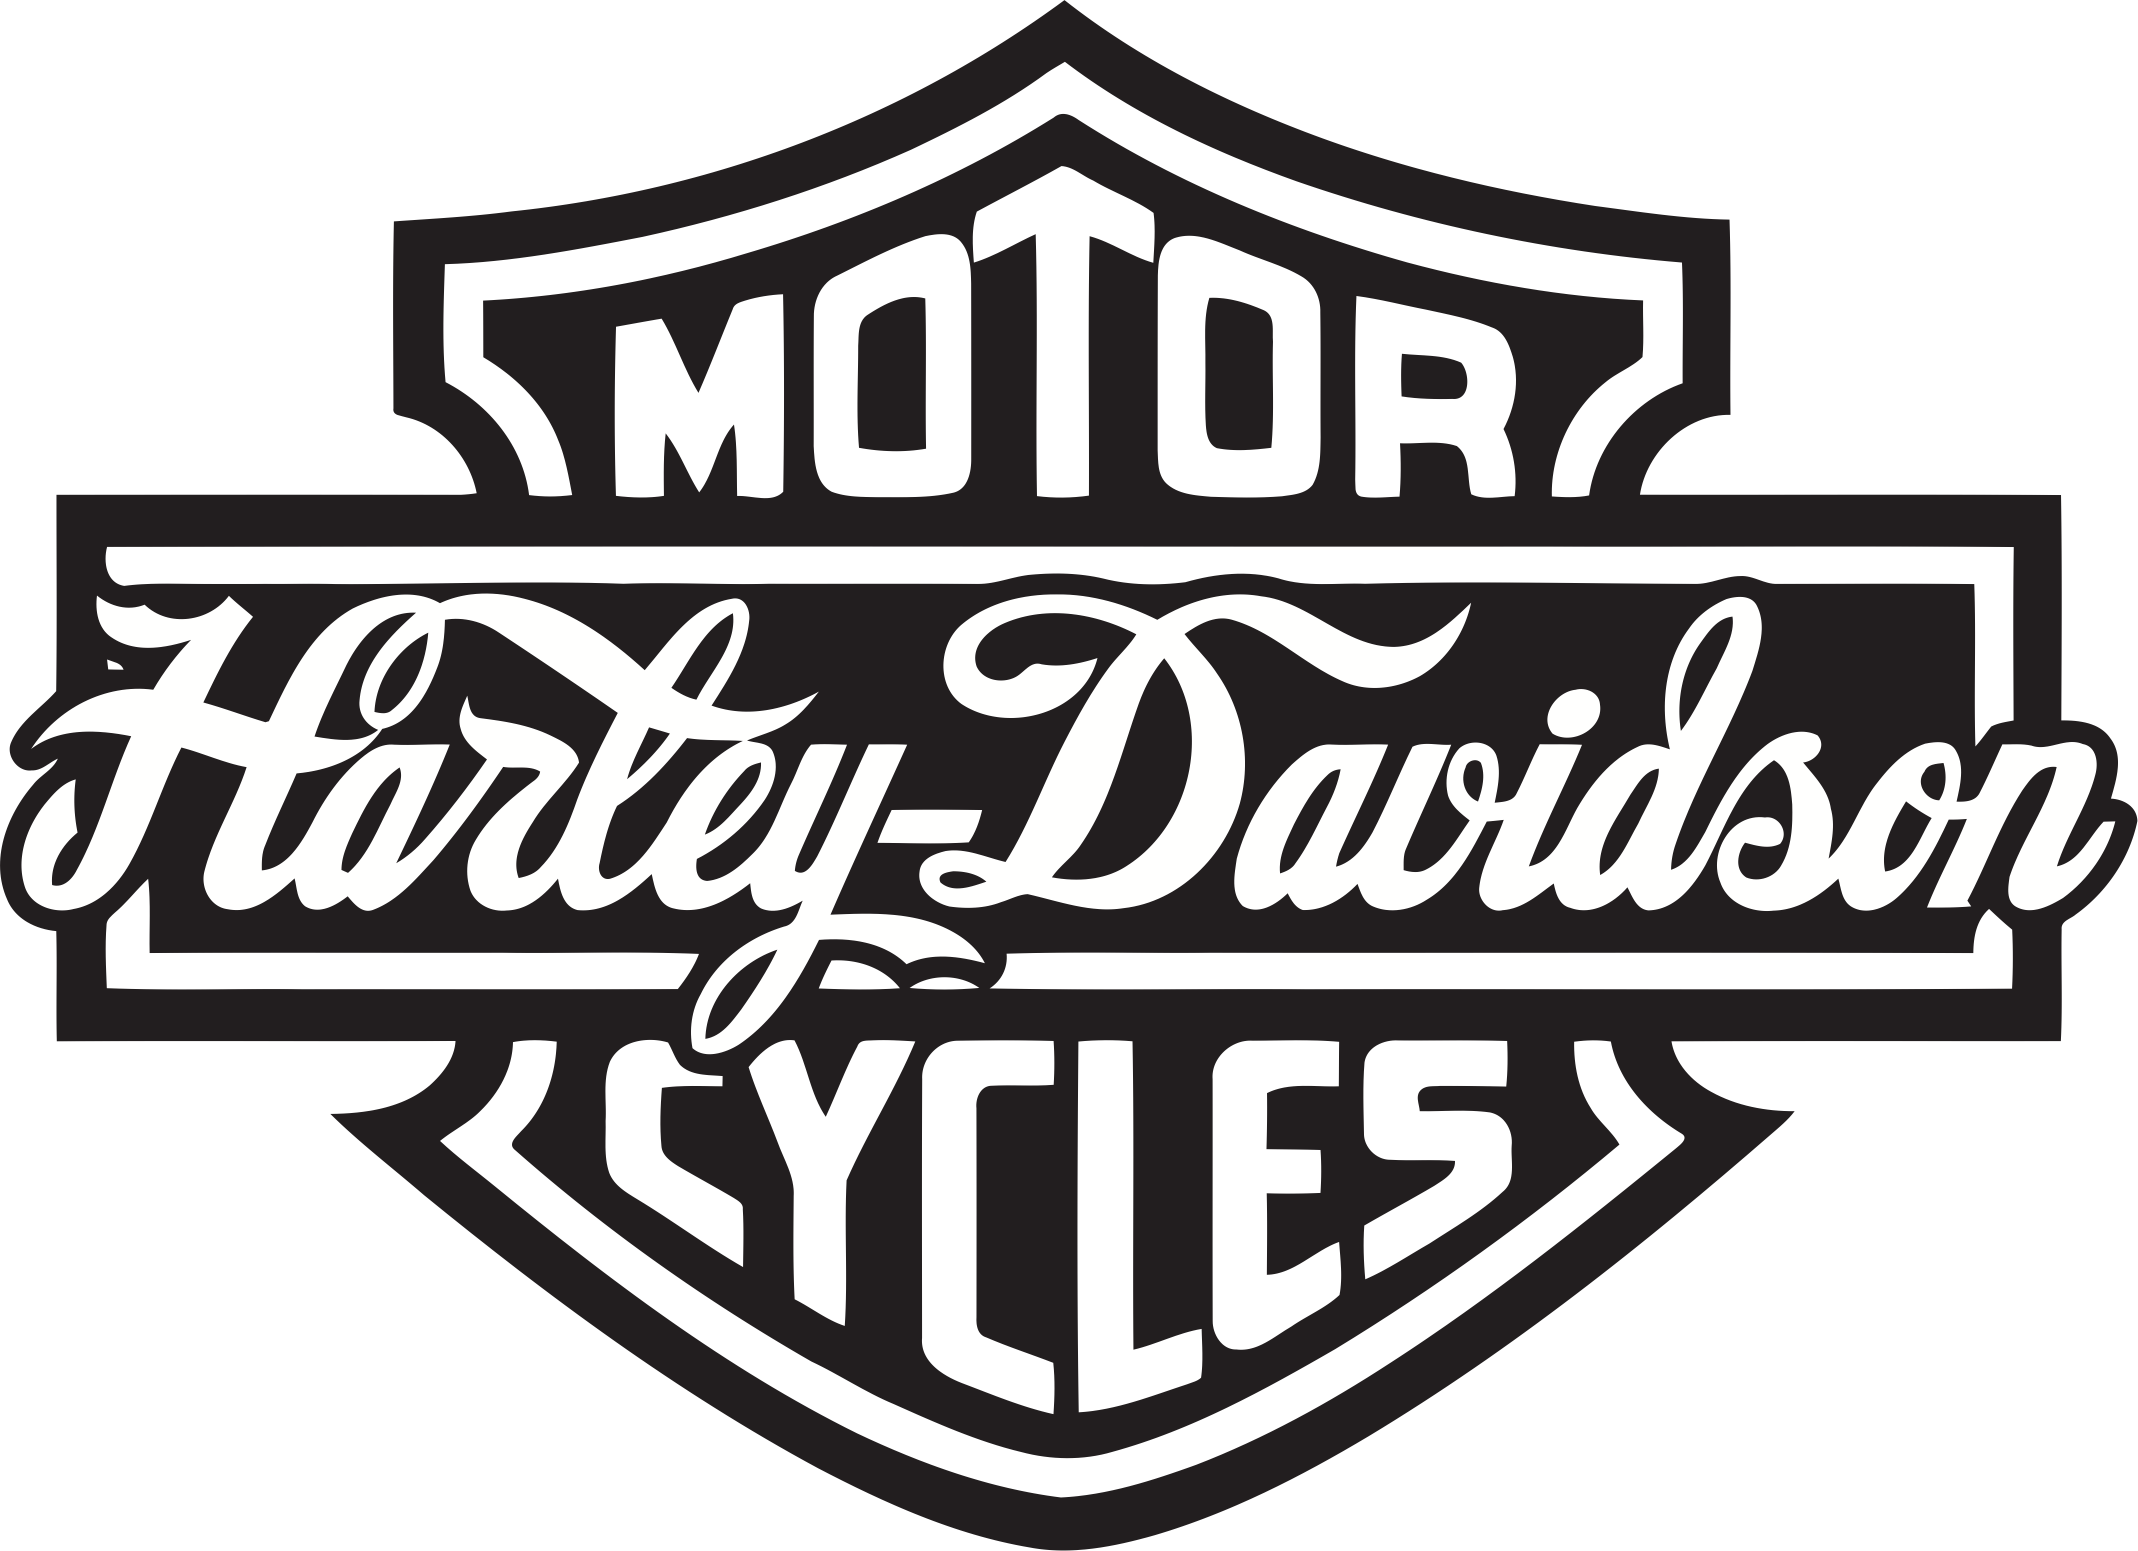 Harley Davidson Logo Png Image Harley Davidson Wallpaper Harley Davidson Decals Harley Davidson Stickers